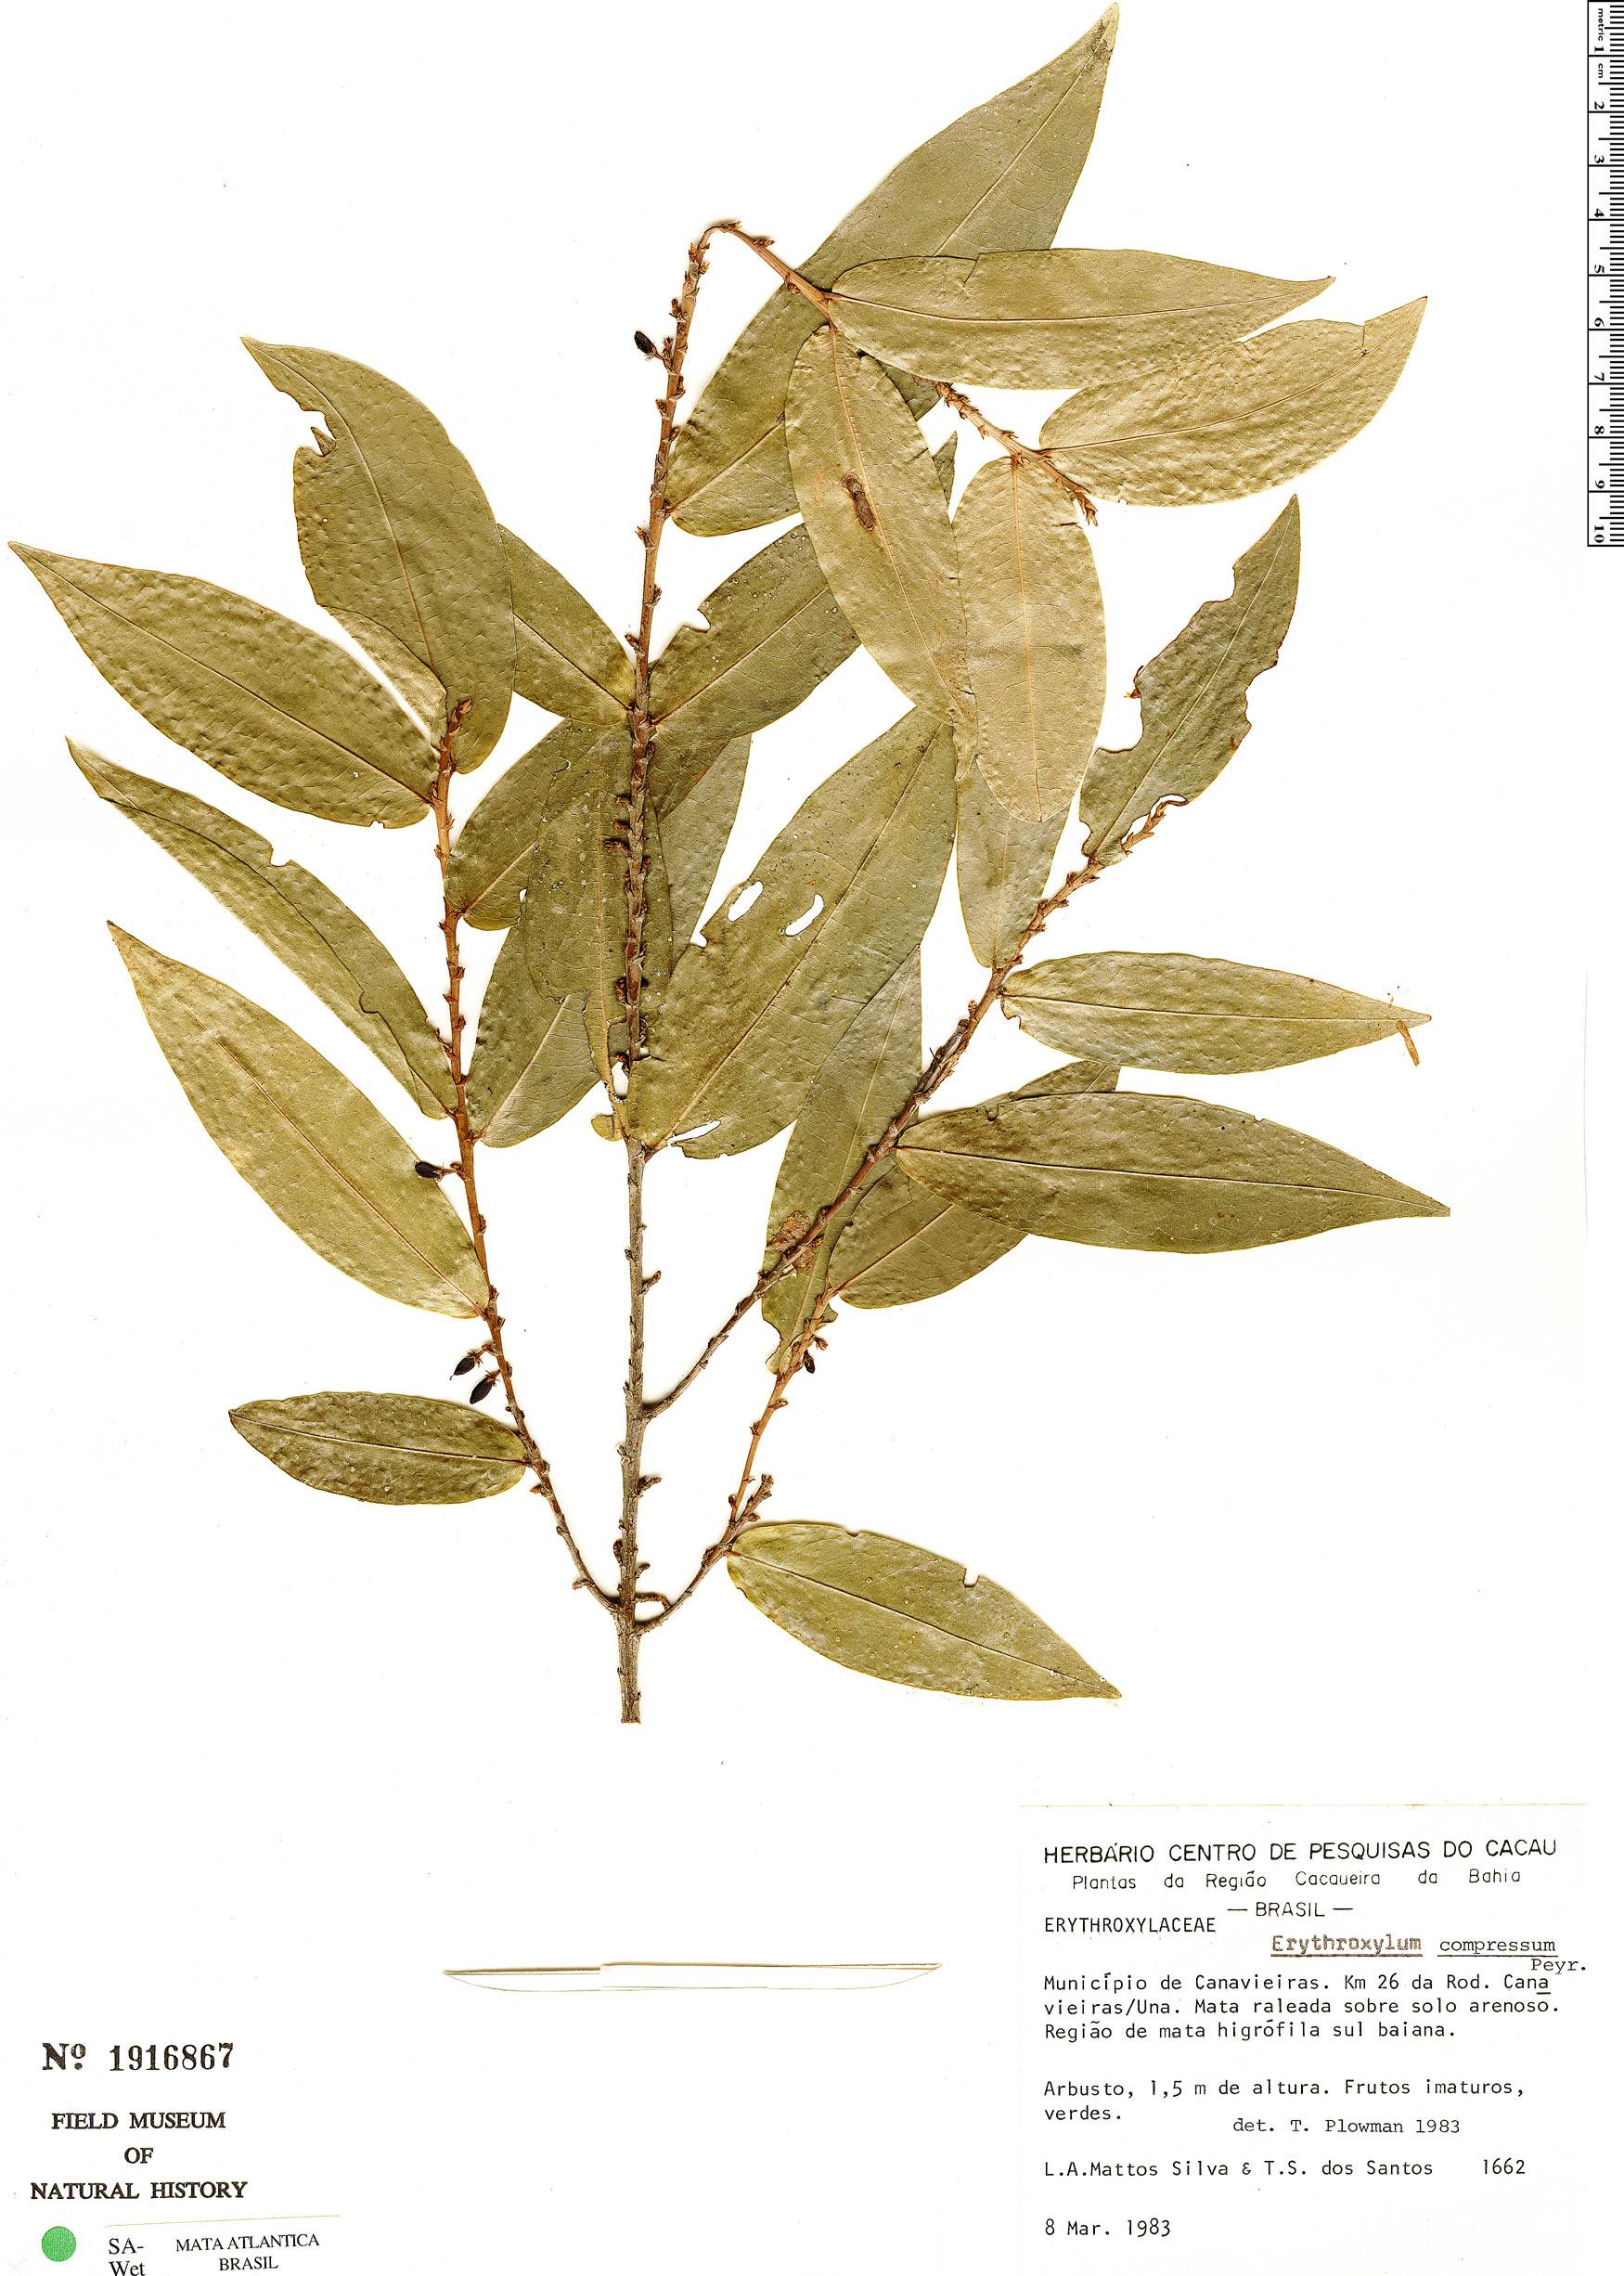 Specimen: Erythroxylum compressum